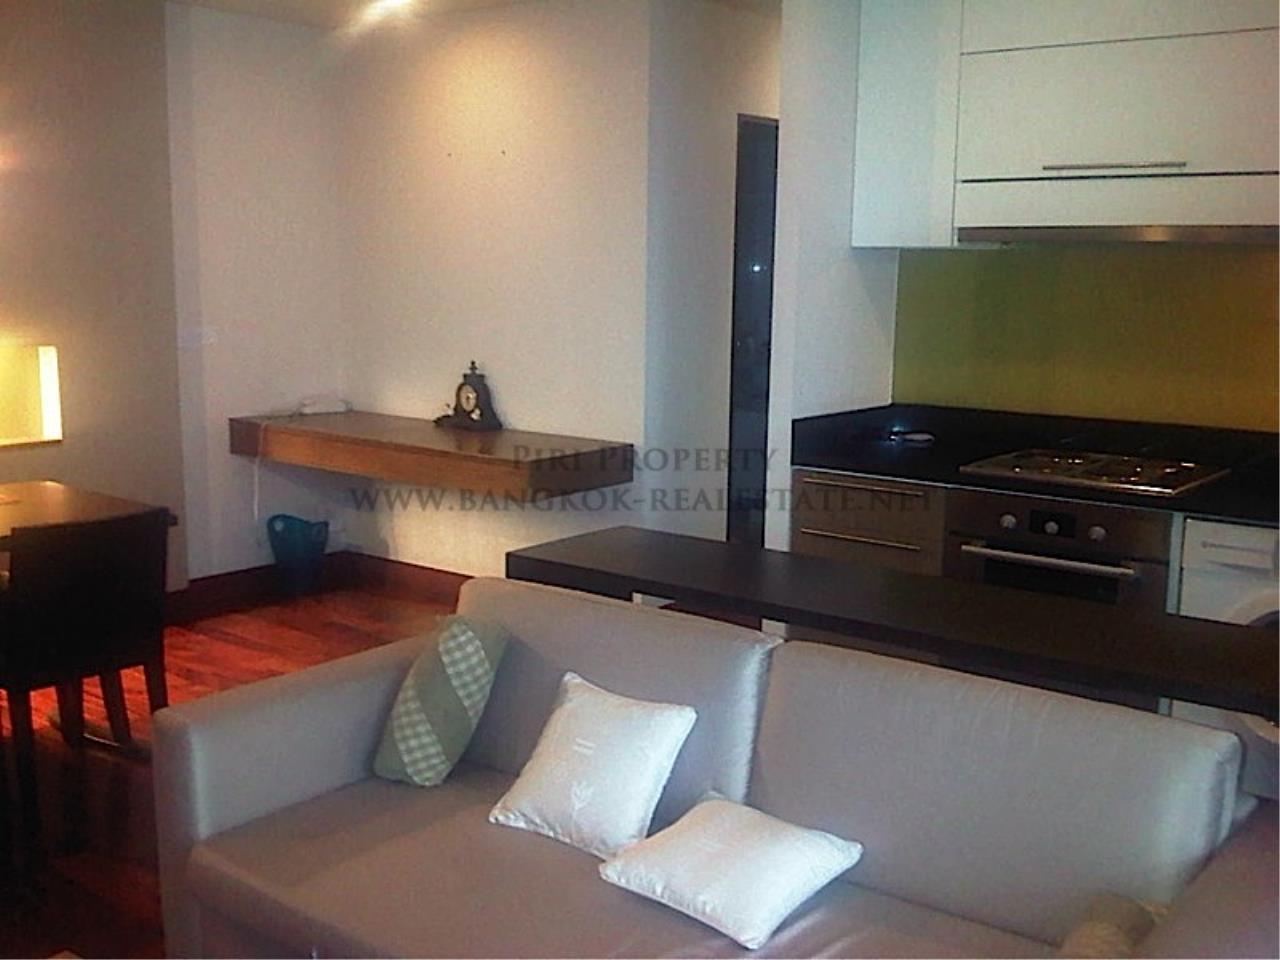 Piri Property Agency's Urbana Langsuan - One Bedroom in the CDB 4